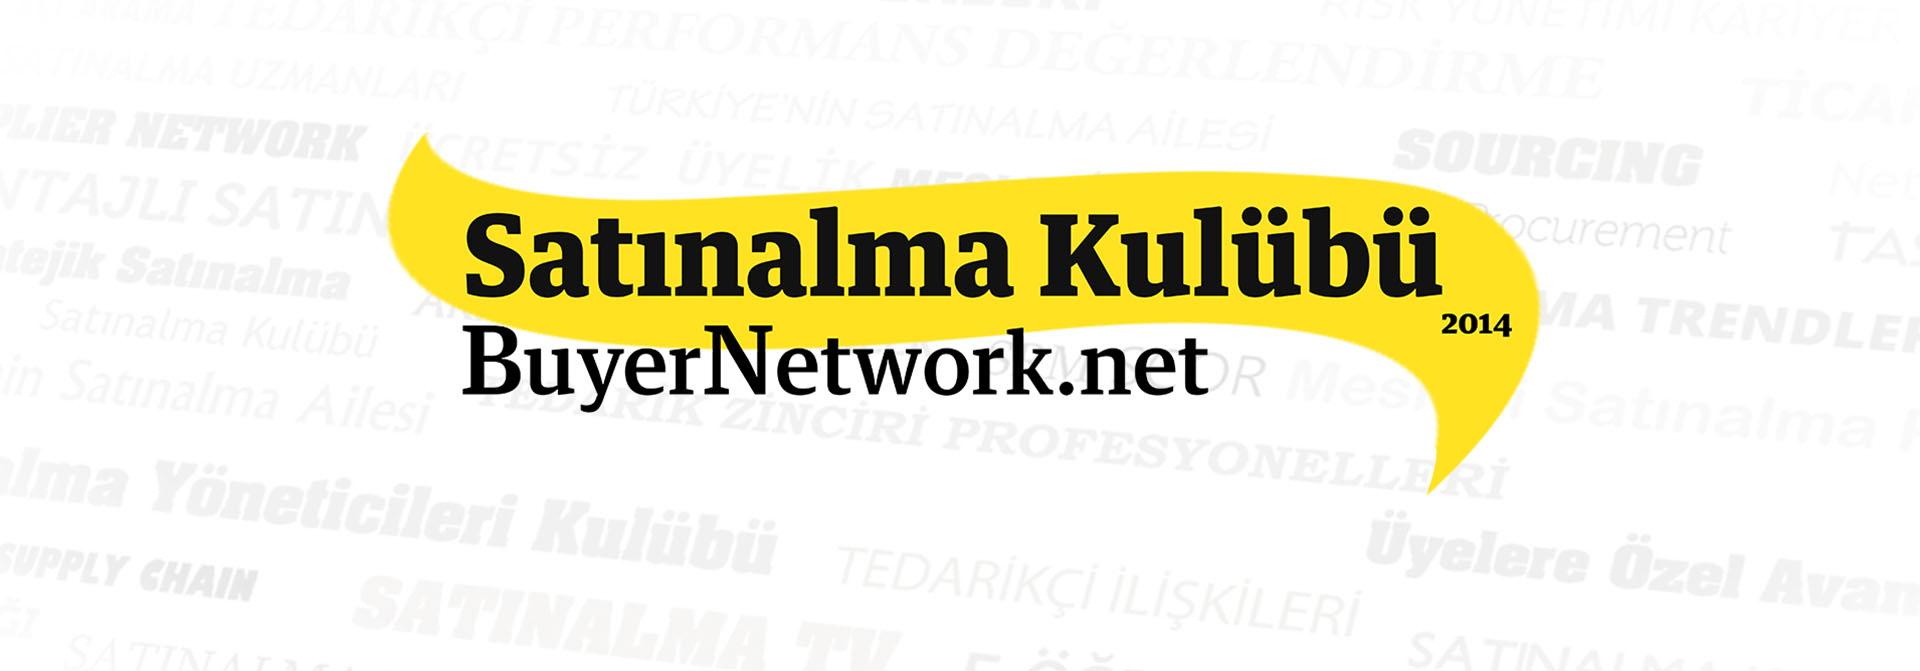 https://tedarikzinciri.org/wp-content/uploads/2018/10/satinalma-3.jpg